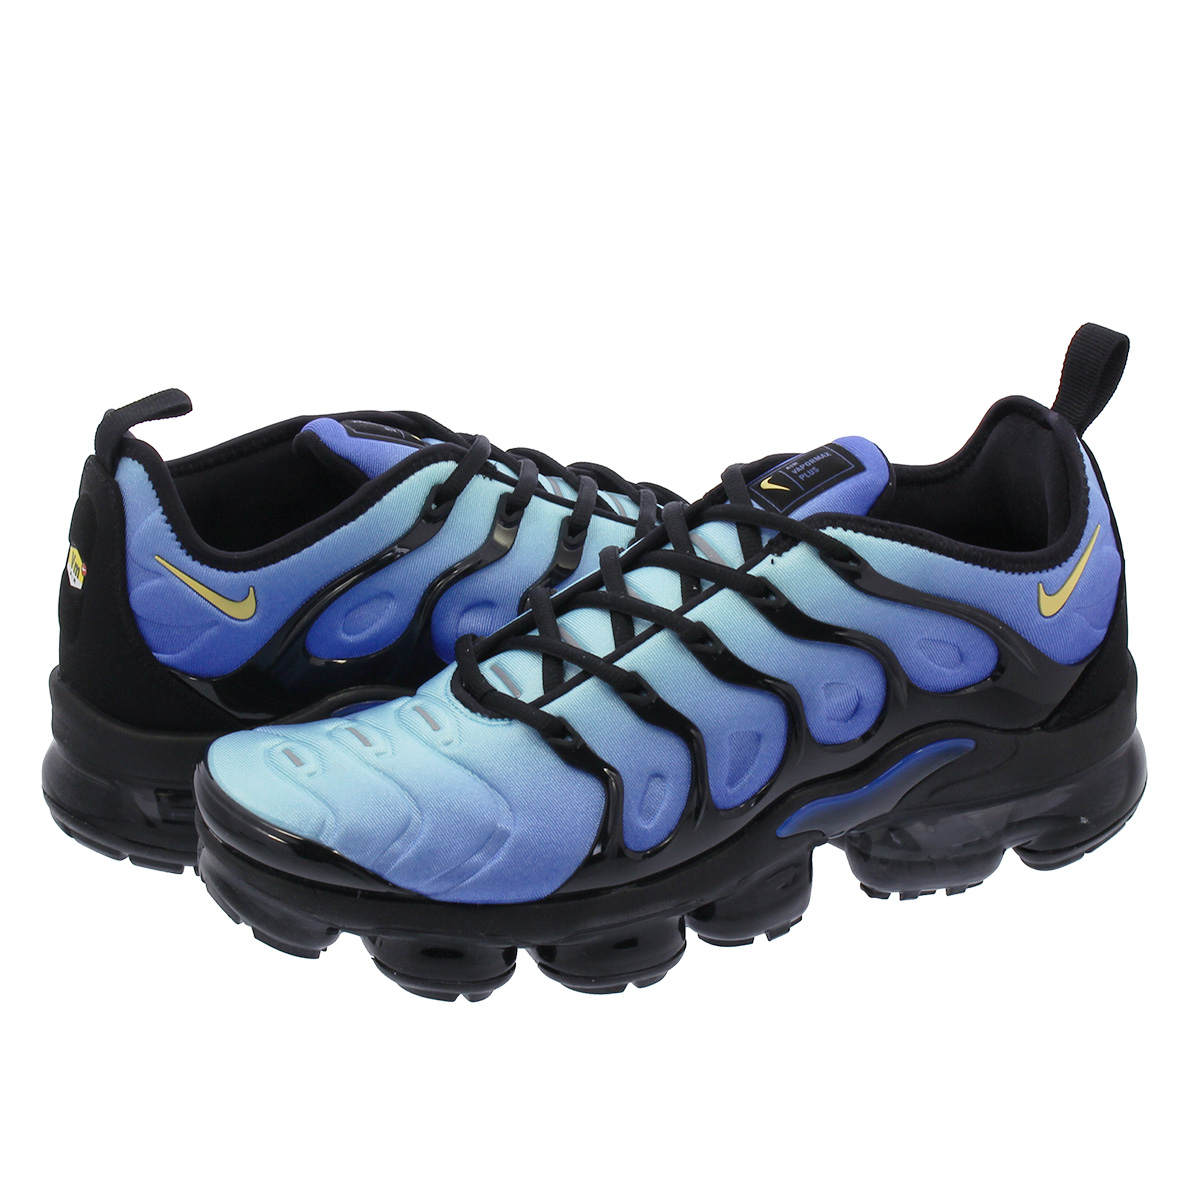 dabb2977607b NIKE AIR VAPORMAX PLUS Nike vapor max plus BLACK CHAMPOIS HYPER BLUE  924